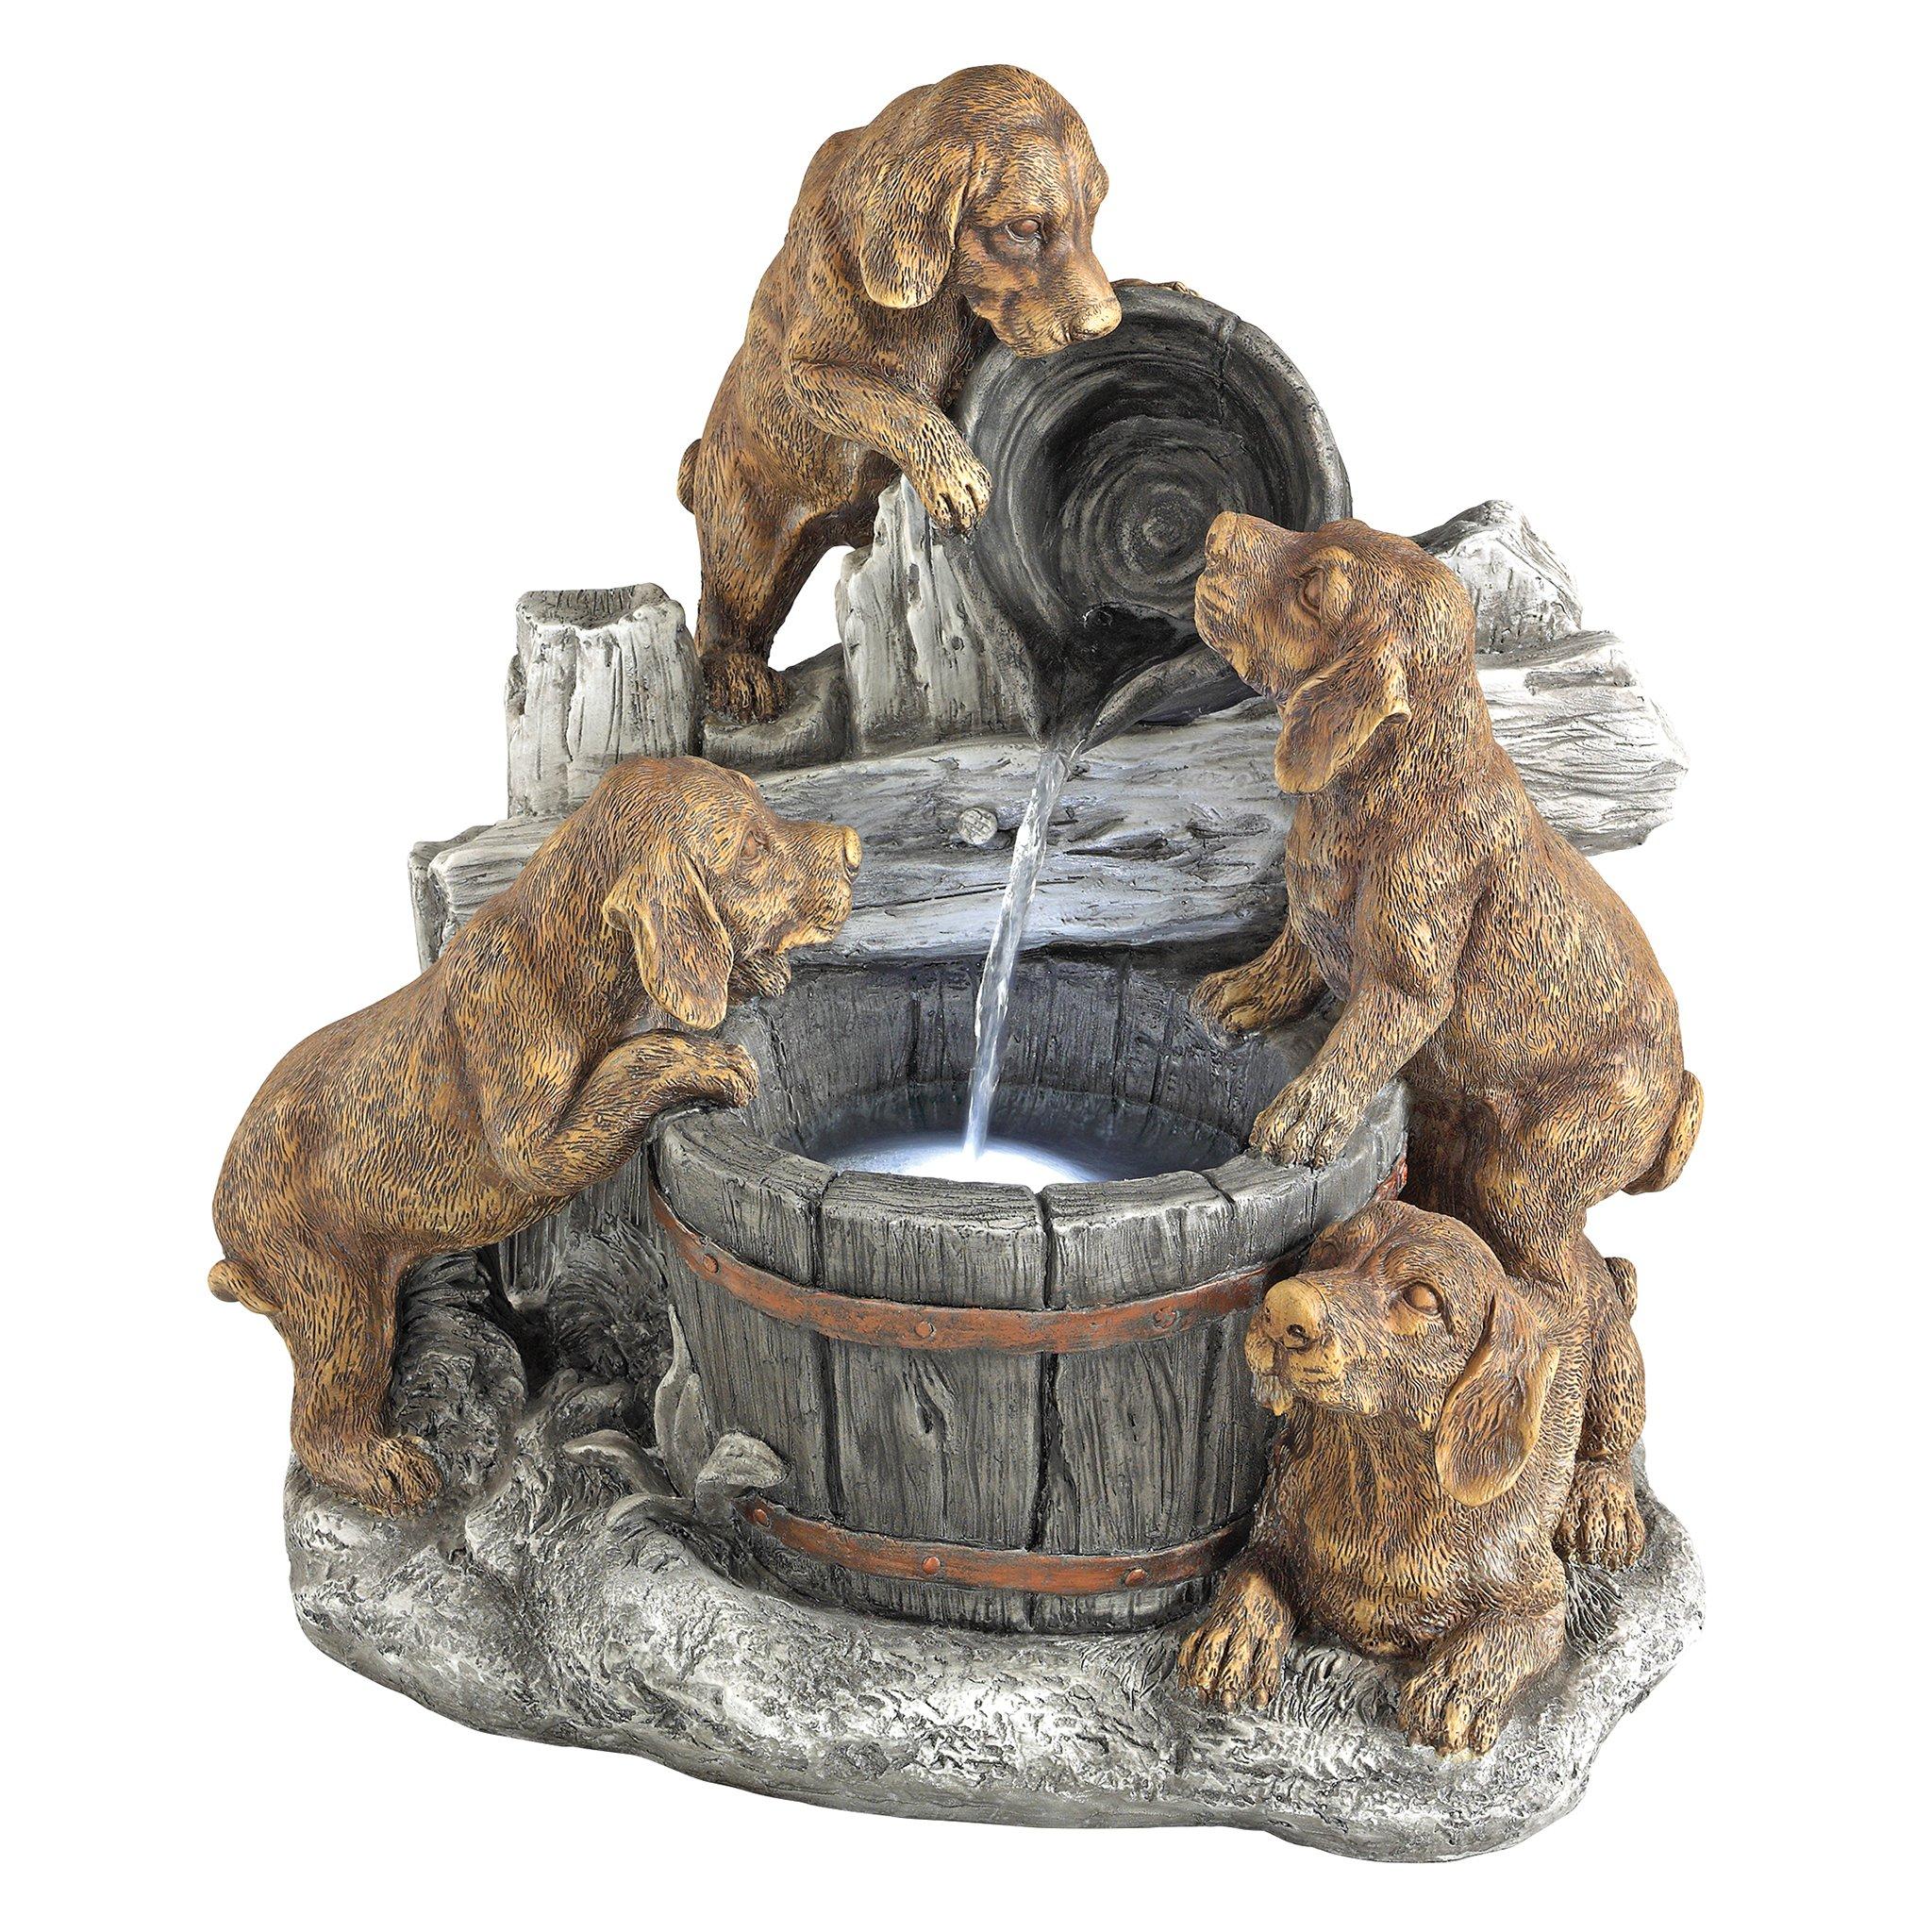 Design Toscano SH382614 Puppy Pail Pour Dog Garden Decor Cascading Fountain Water Feature, 21 Inch, Full Color